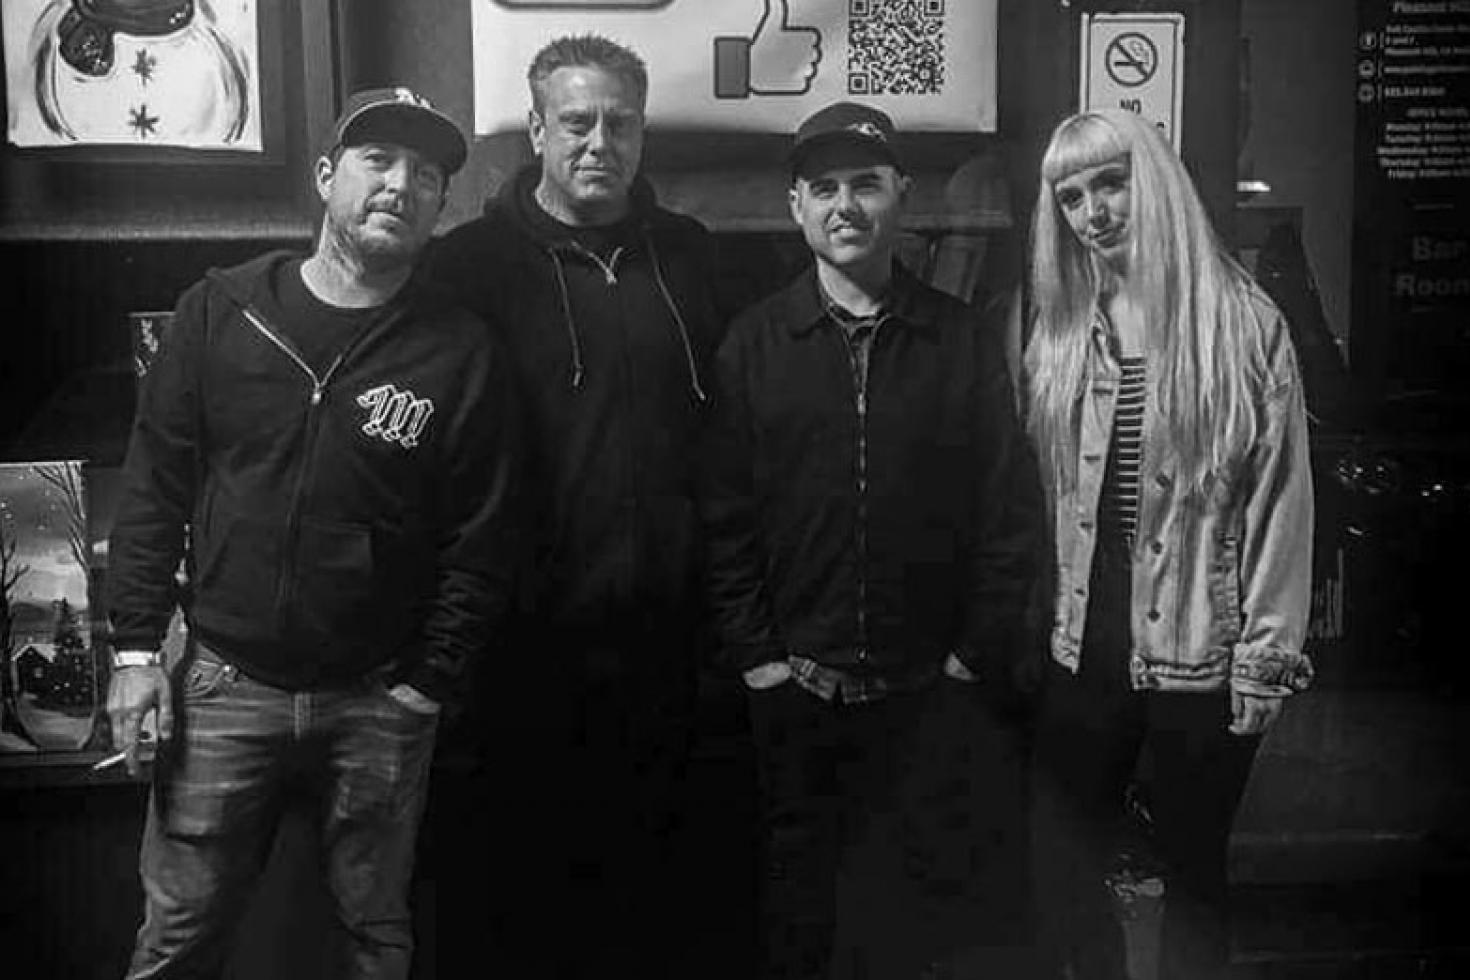 Civil War Rust release new EP 'Shaky'